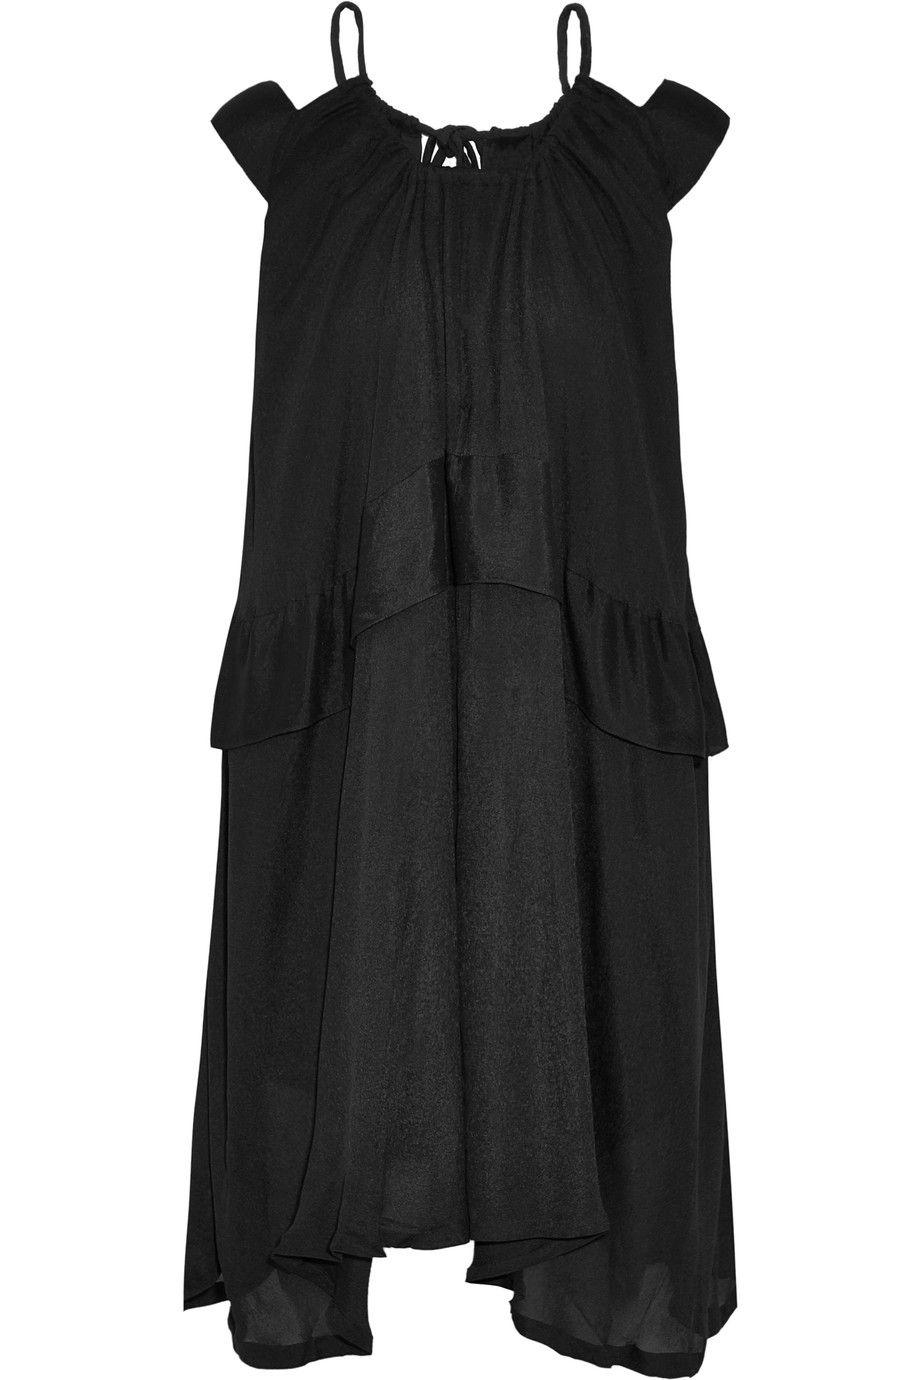 Iro Woman Ruffled Cold-shoulder Cutout Crepe De Chine Mini Dress Black Size 34 Iro zxUIjggX8